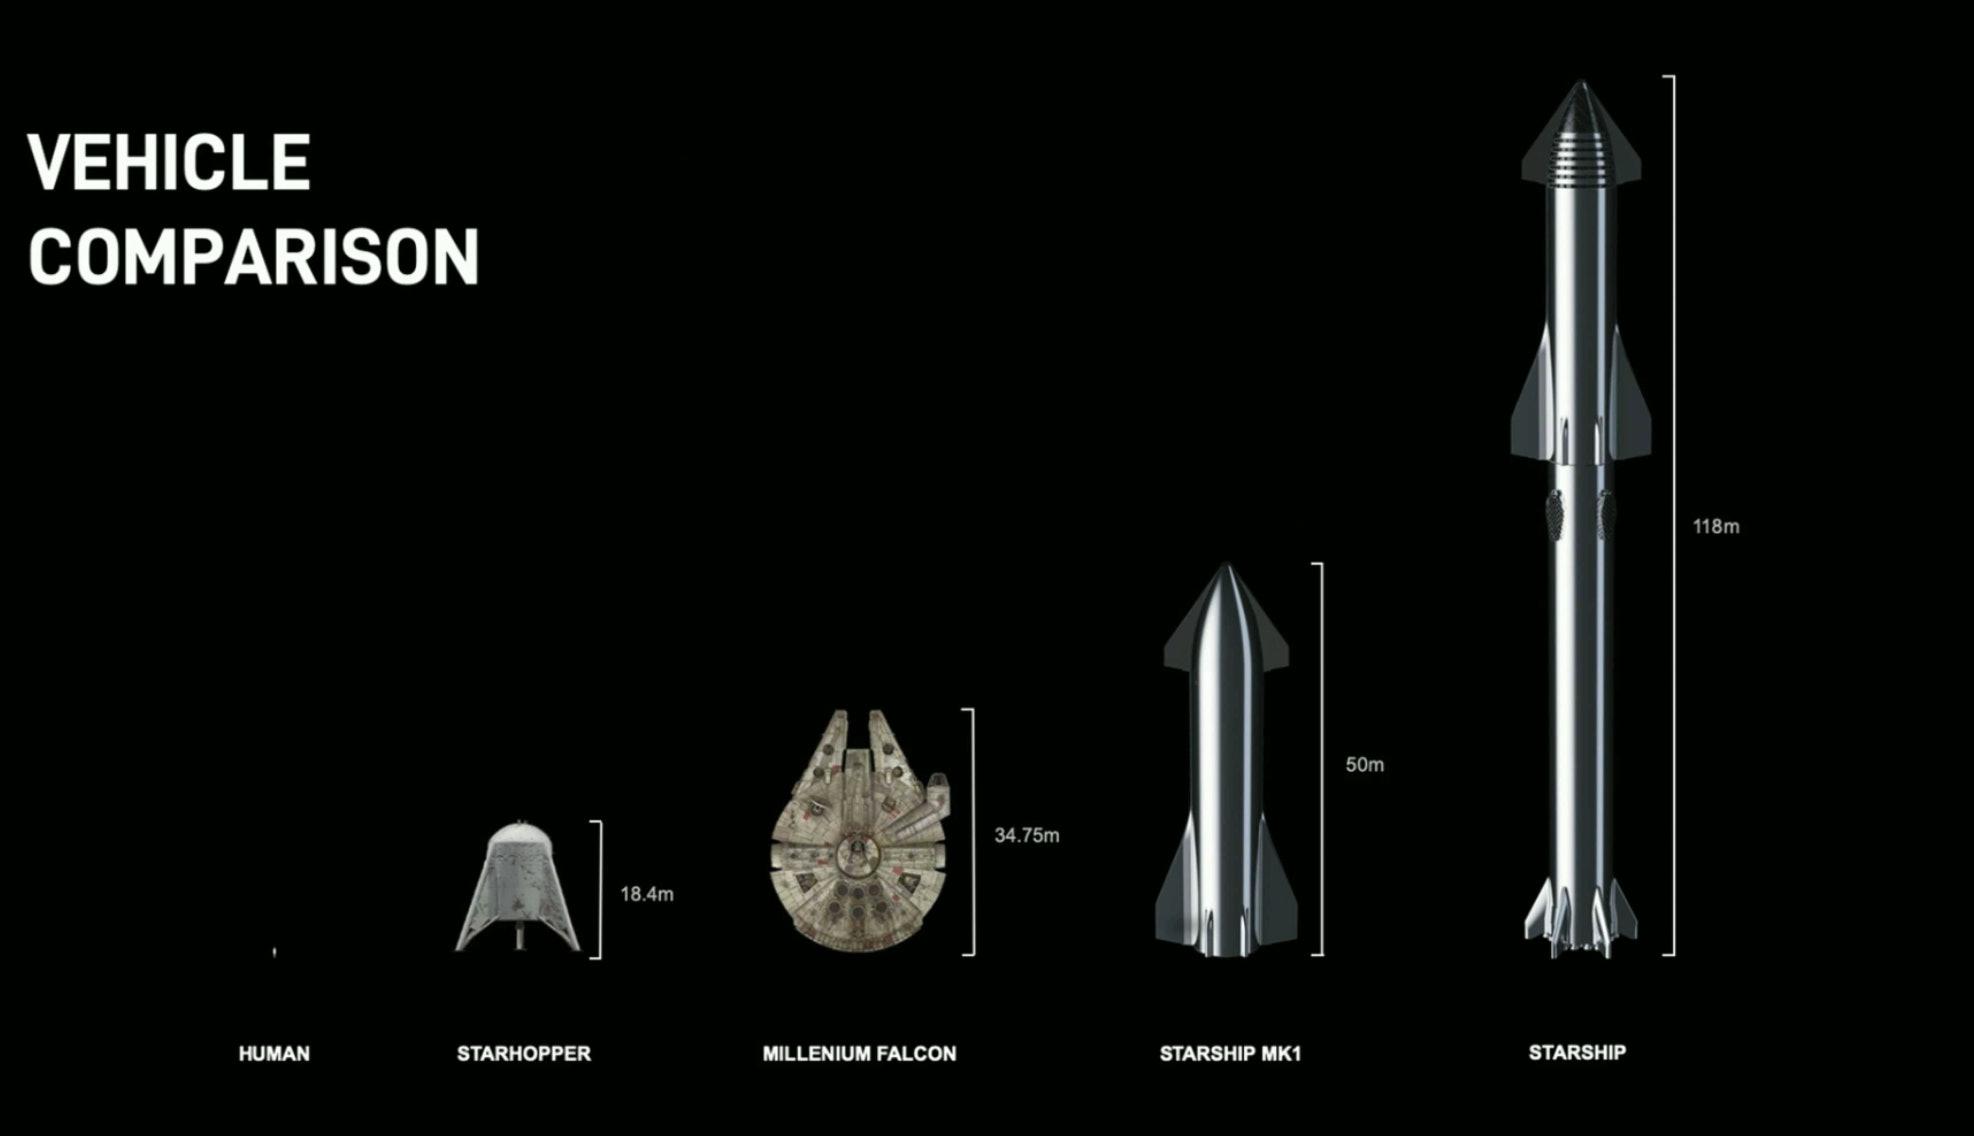 Starship size comparison.